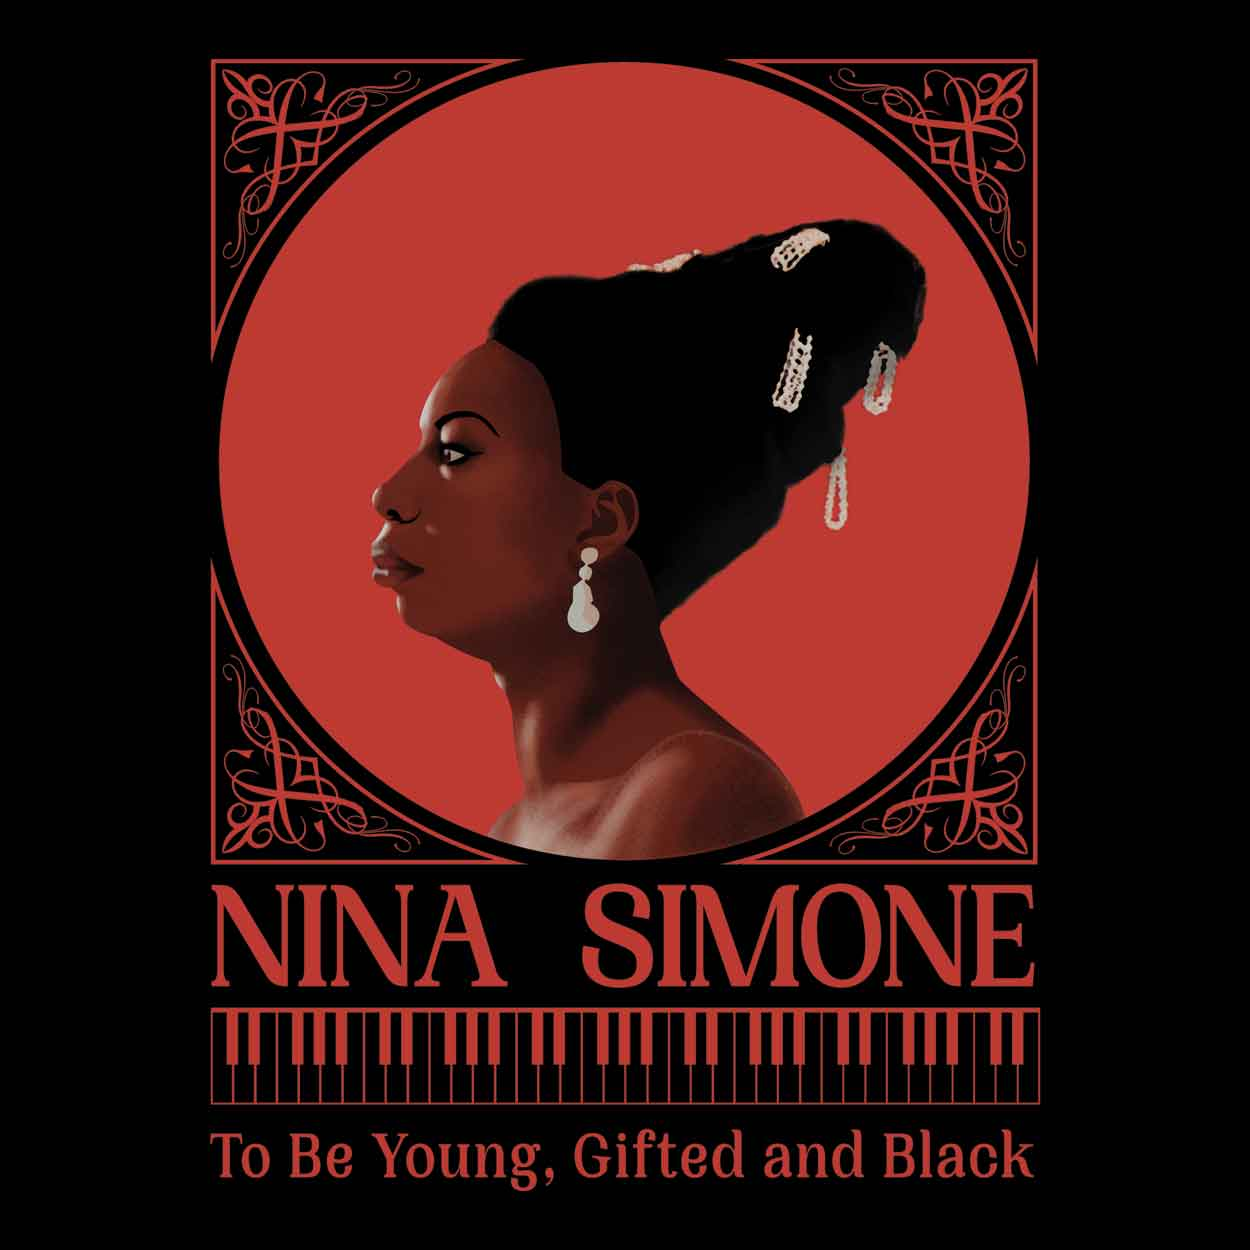 Camiseta - To Be Young, Gifted And Black - Nina Simone - Feminino